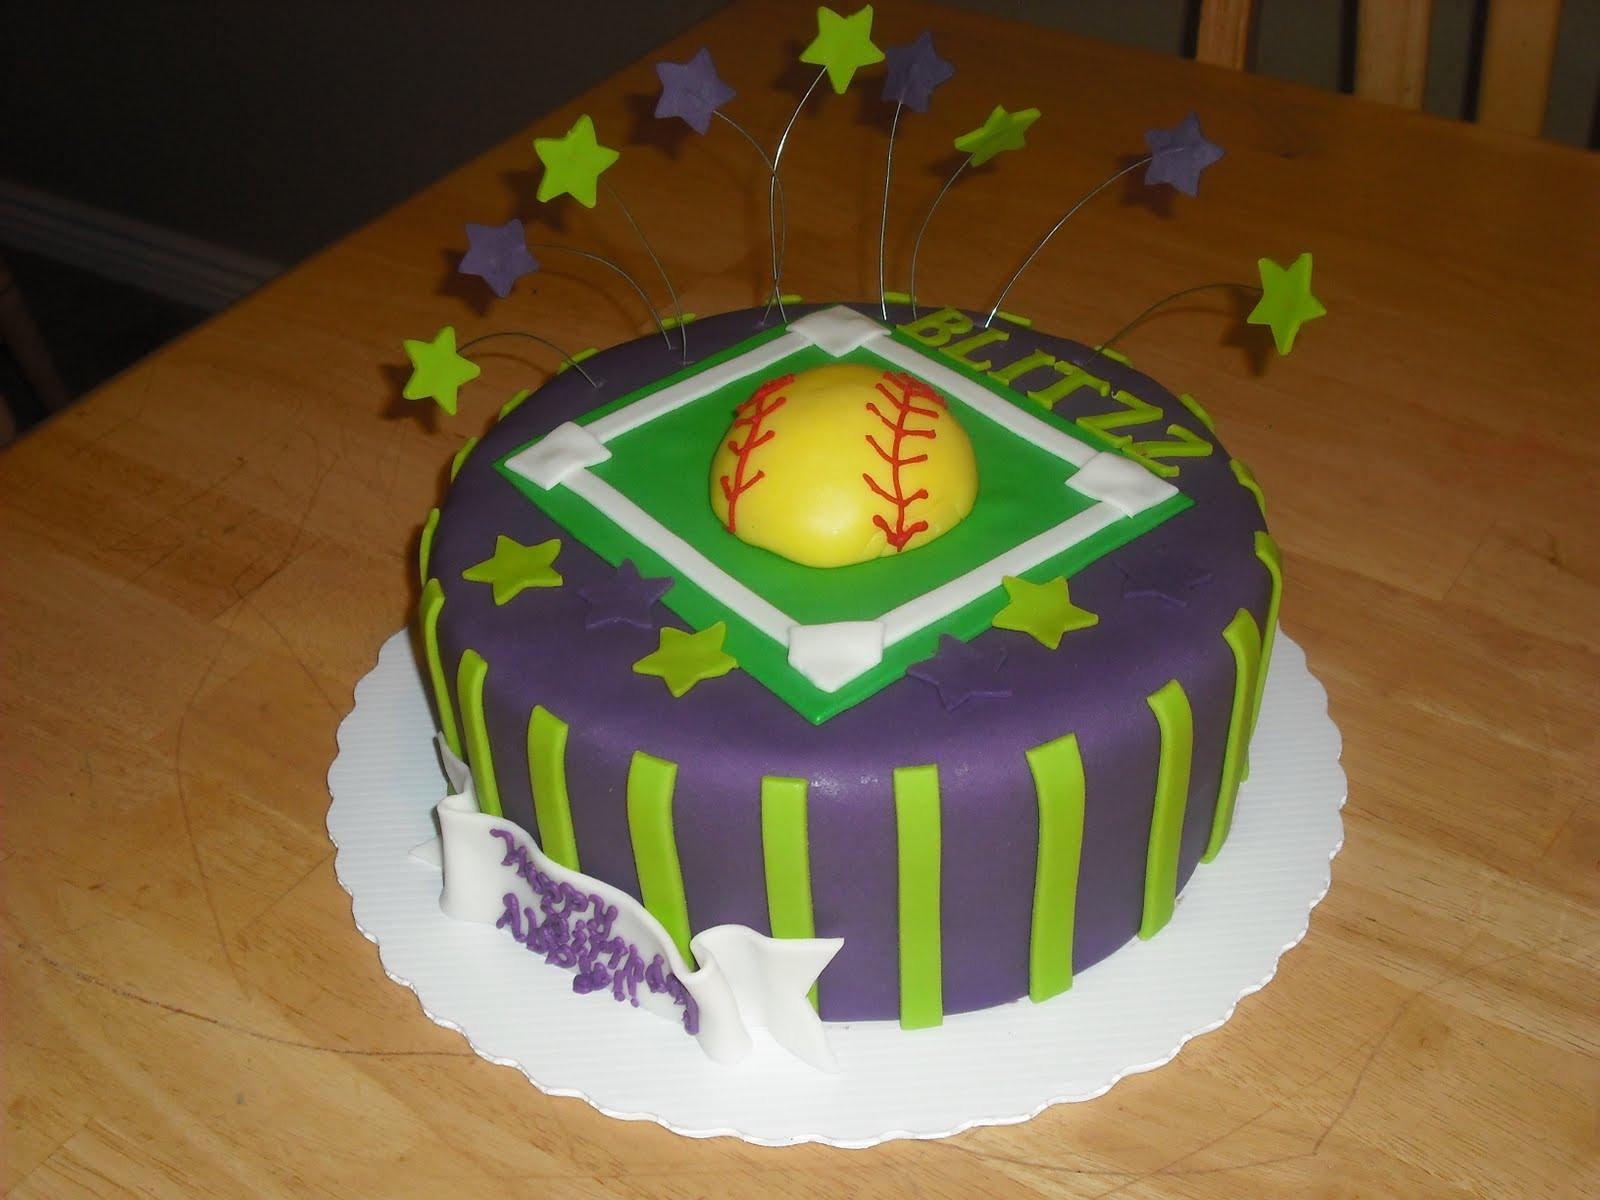 Best ideas about Softball Birthday Cake . Save or Pin Sprinklebelle Softball Birthday Cake Now.